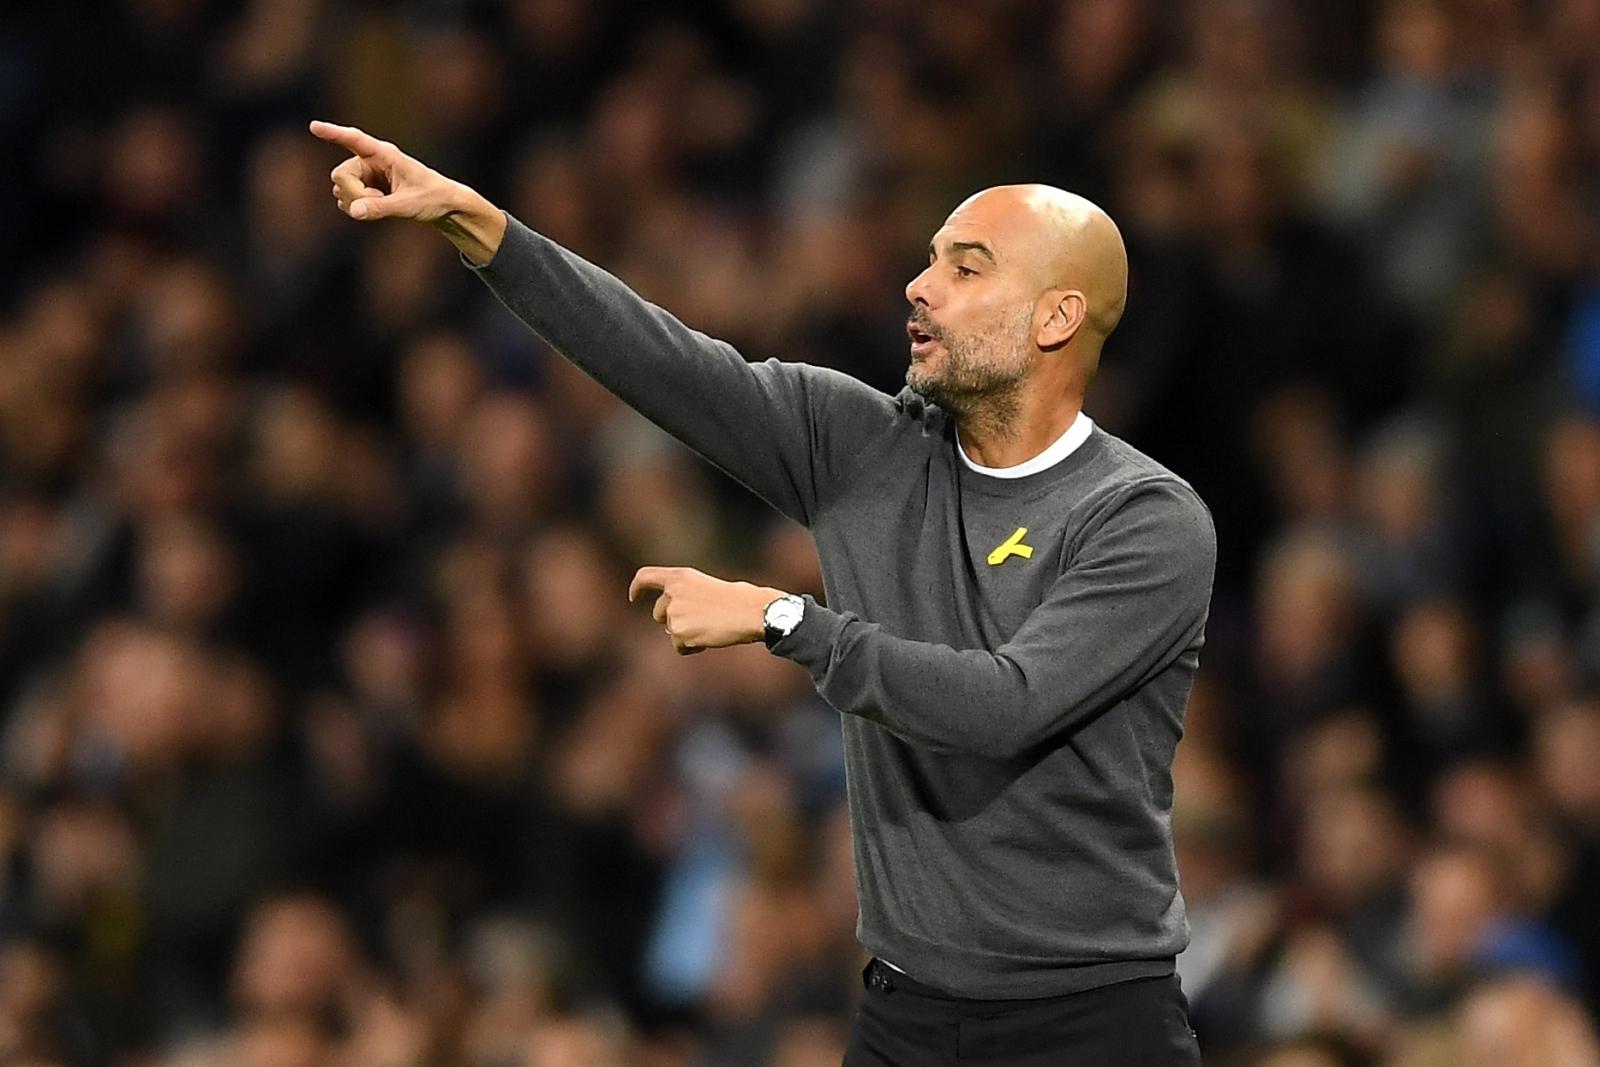 Pep Guardiola to stay at Manchester City despite European ban